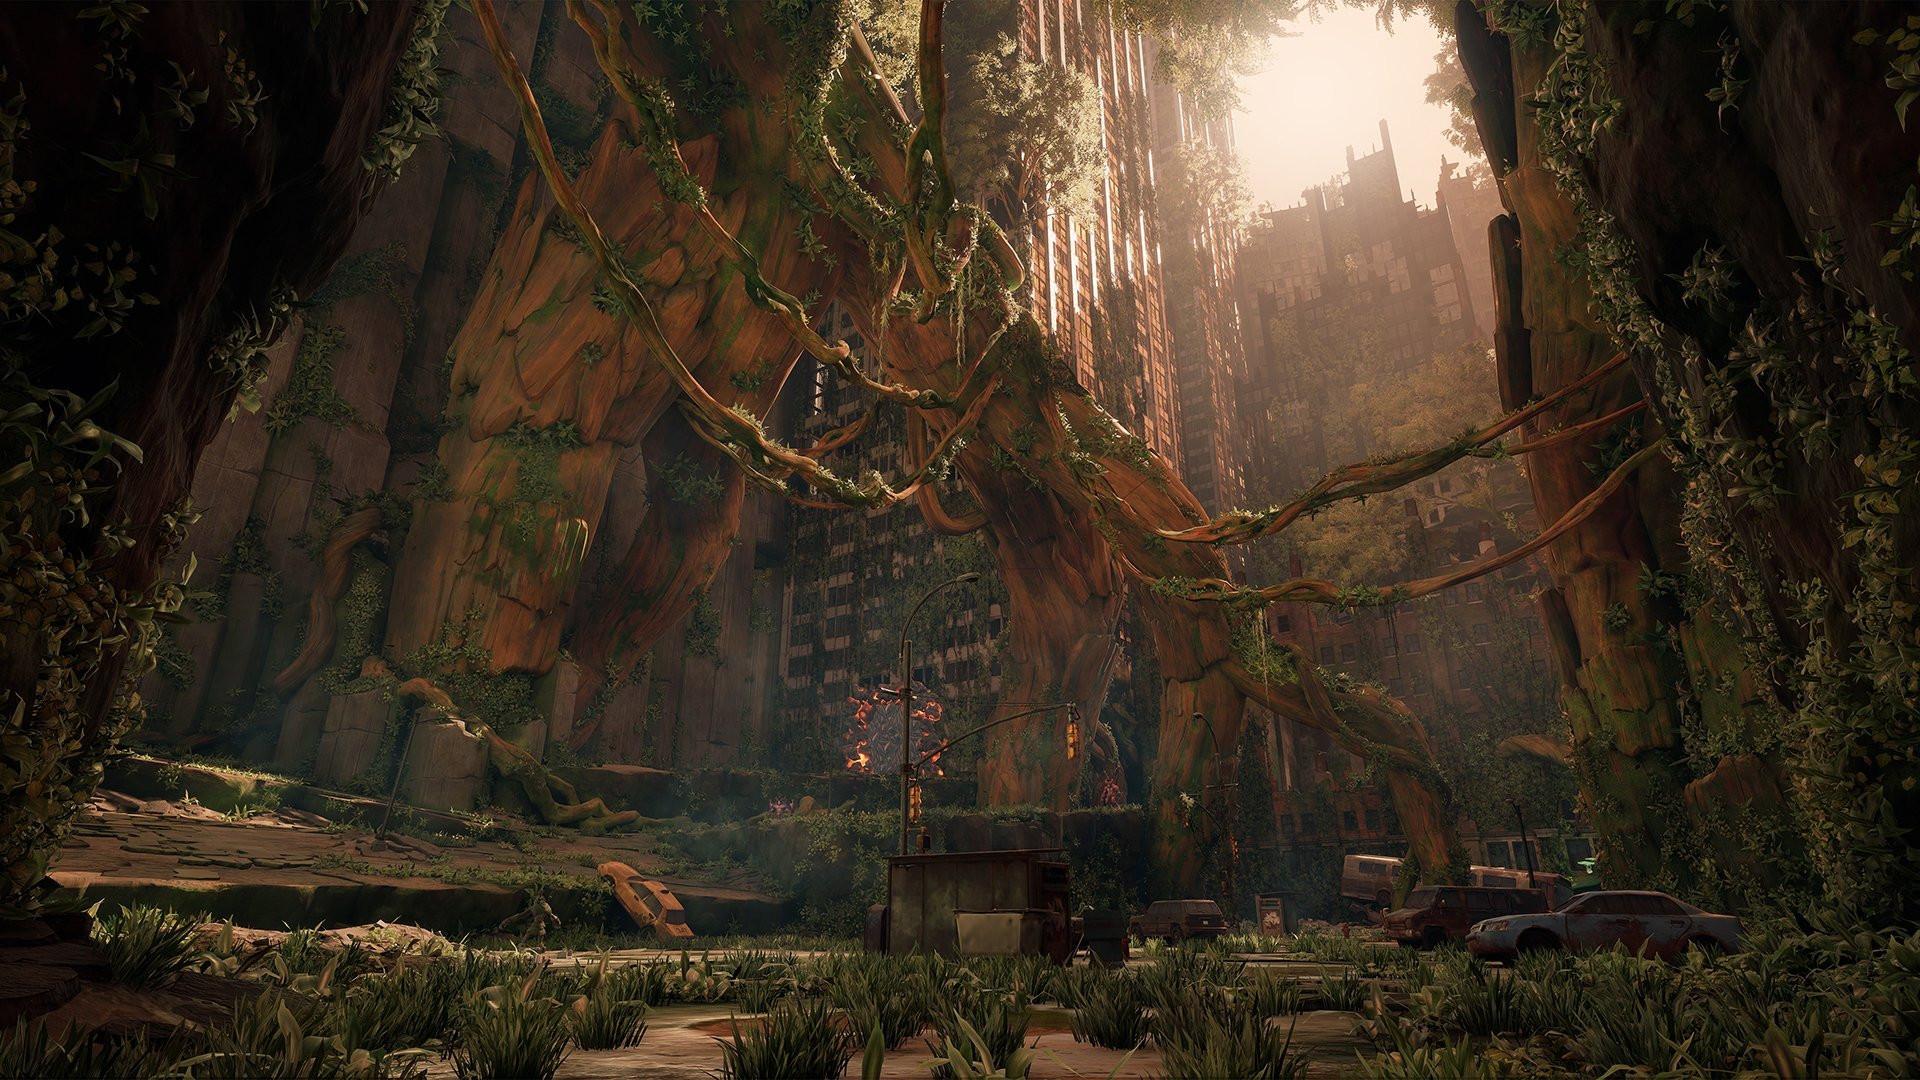 Разработчики Darksiders 3 анонсировали кооперативный шутер Remnant: From The Ashes